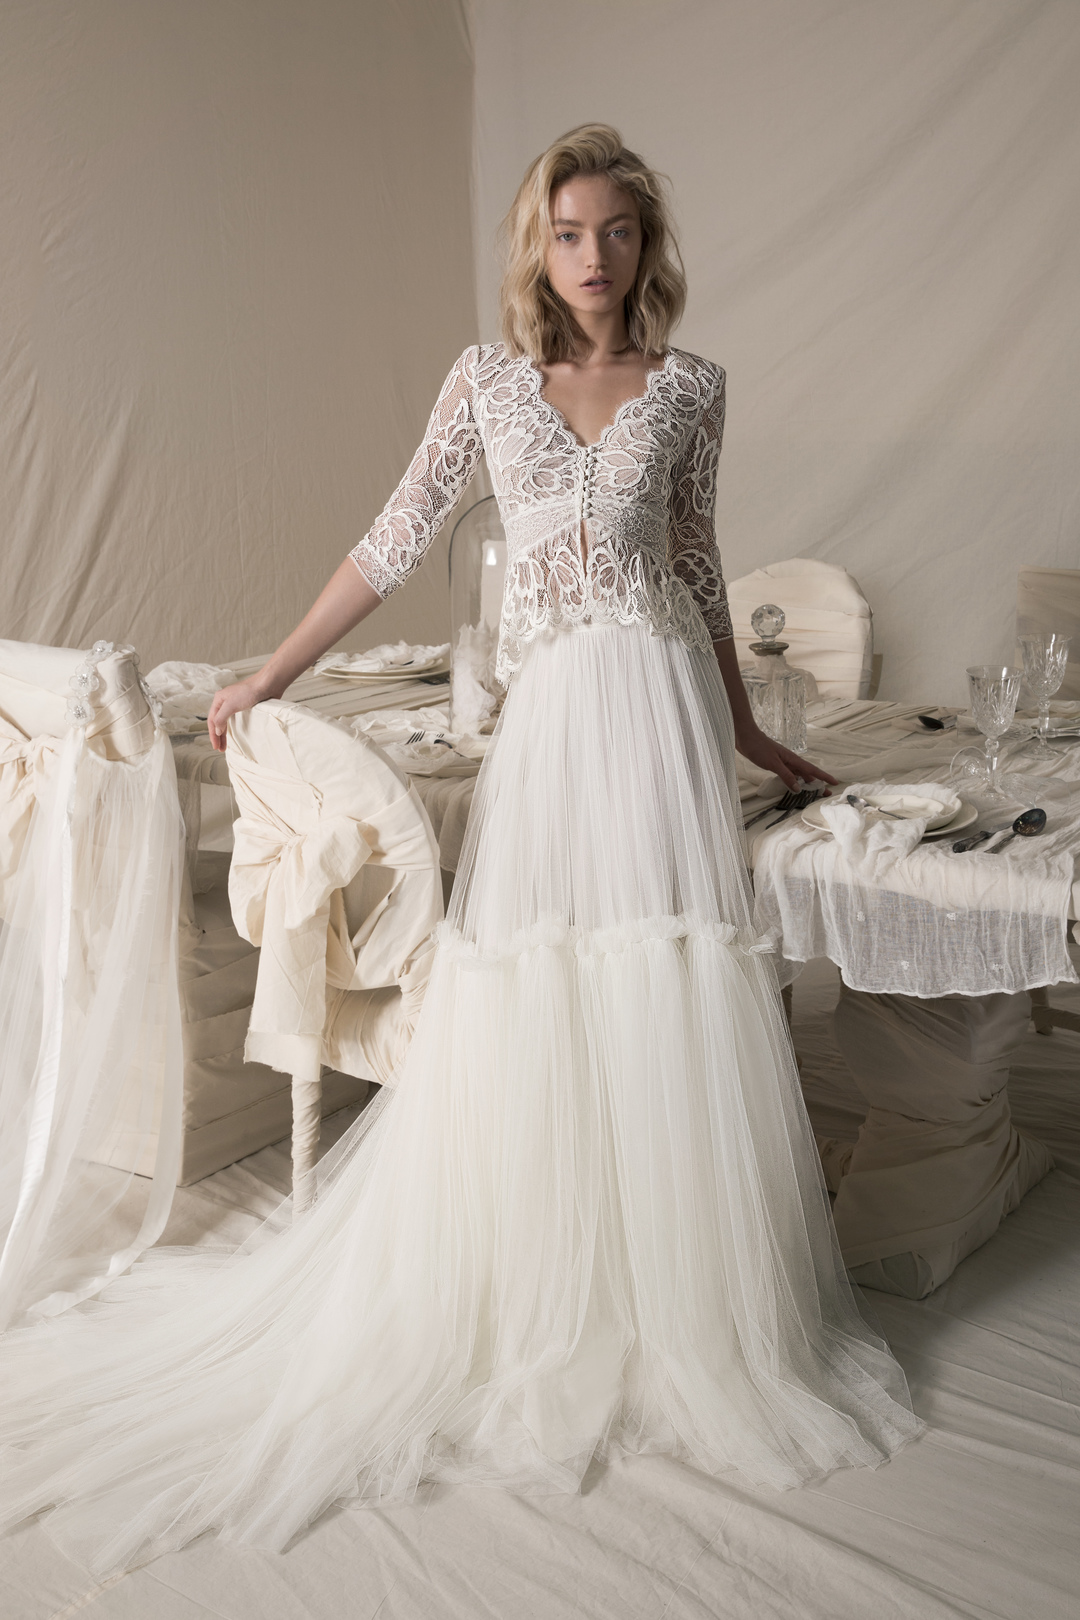 danielle dress photo